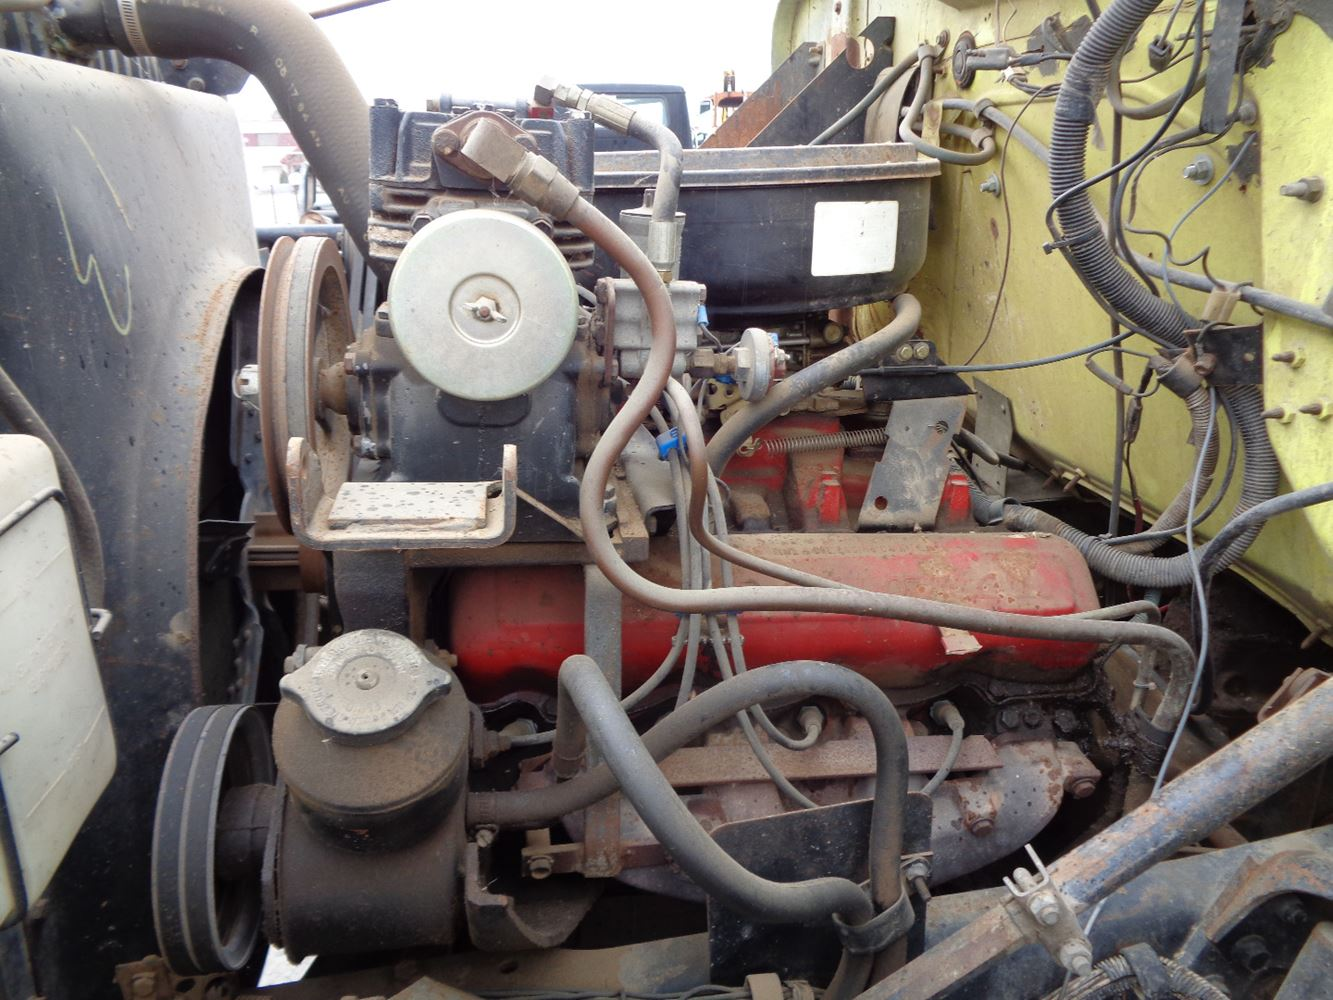 1981 international 392 stock 612 4 air compressors tpi v8 engine control diagram v8 engine wiring diagram